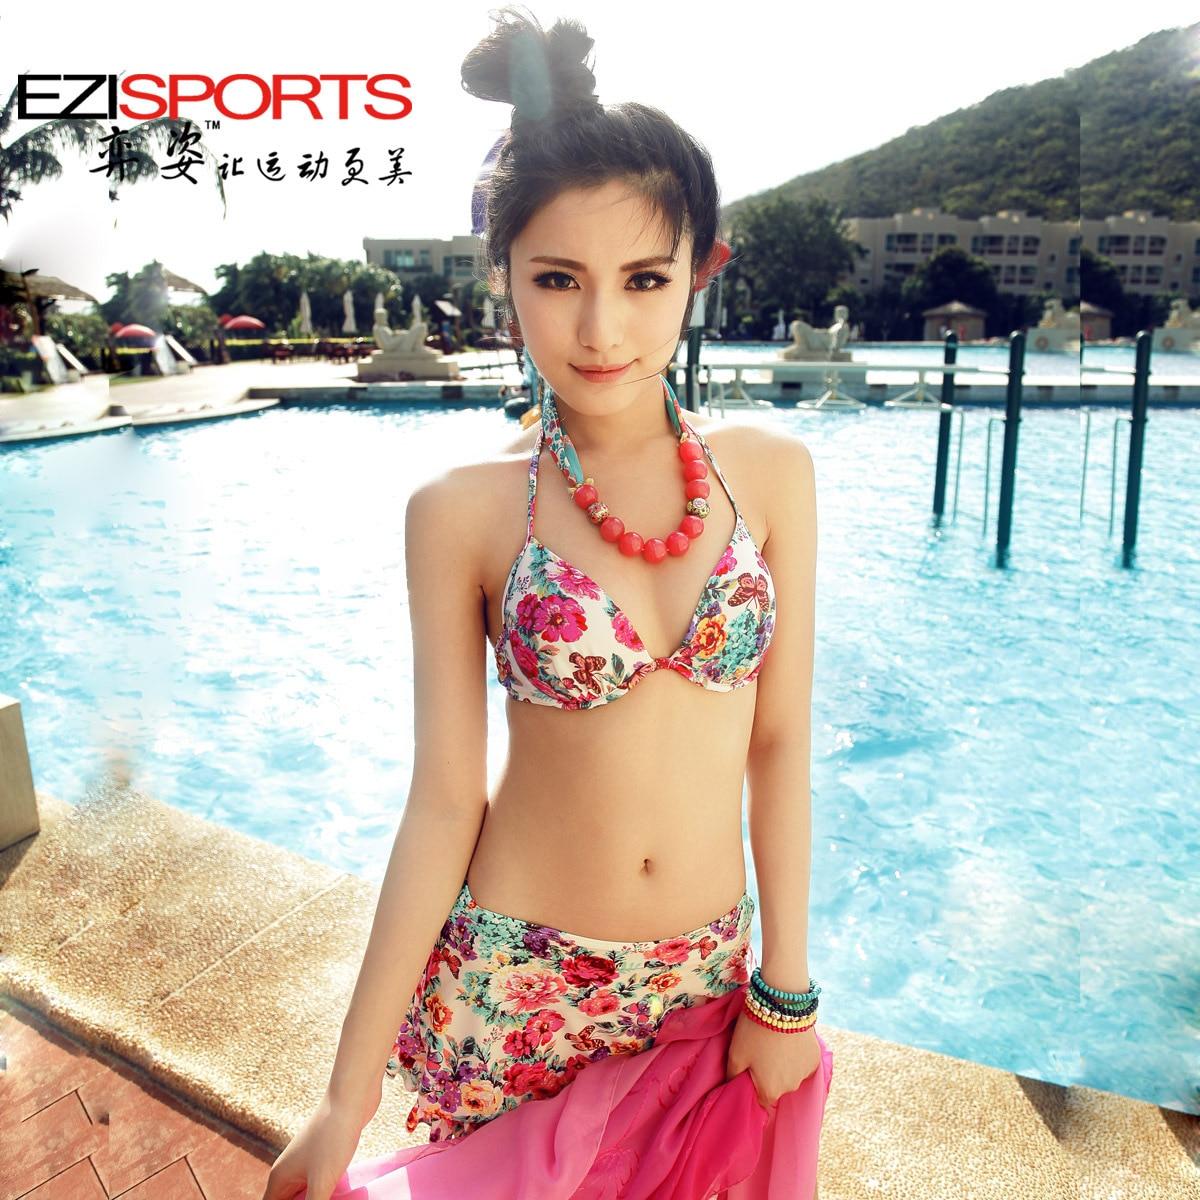 Hot spring swimwear print steel push up bikini piece set female swimwear ezi7023